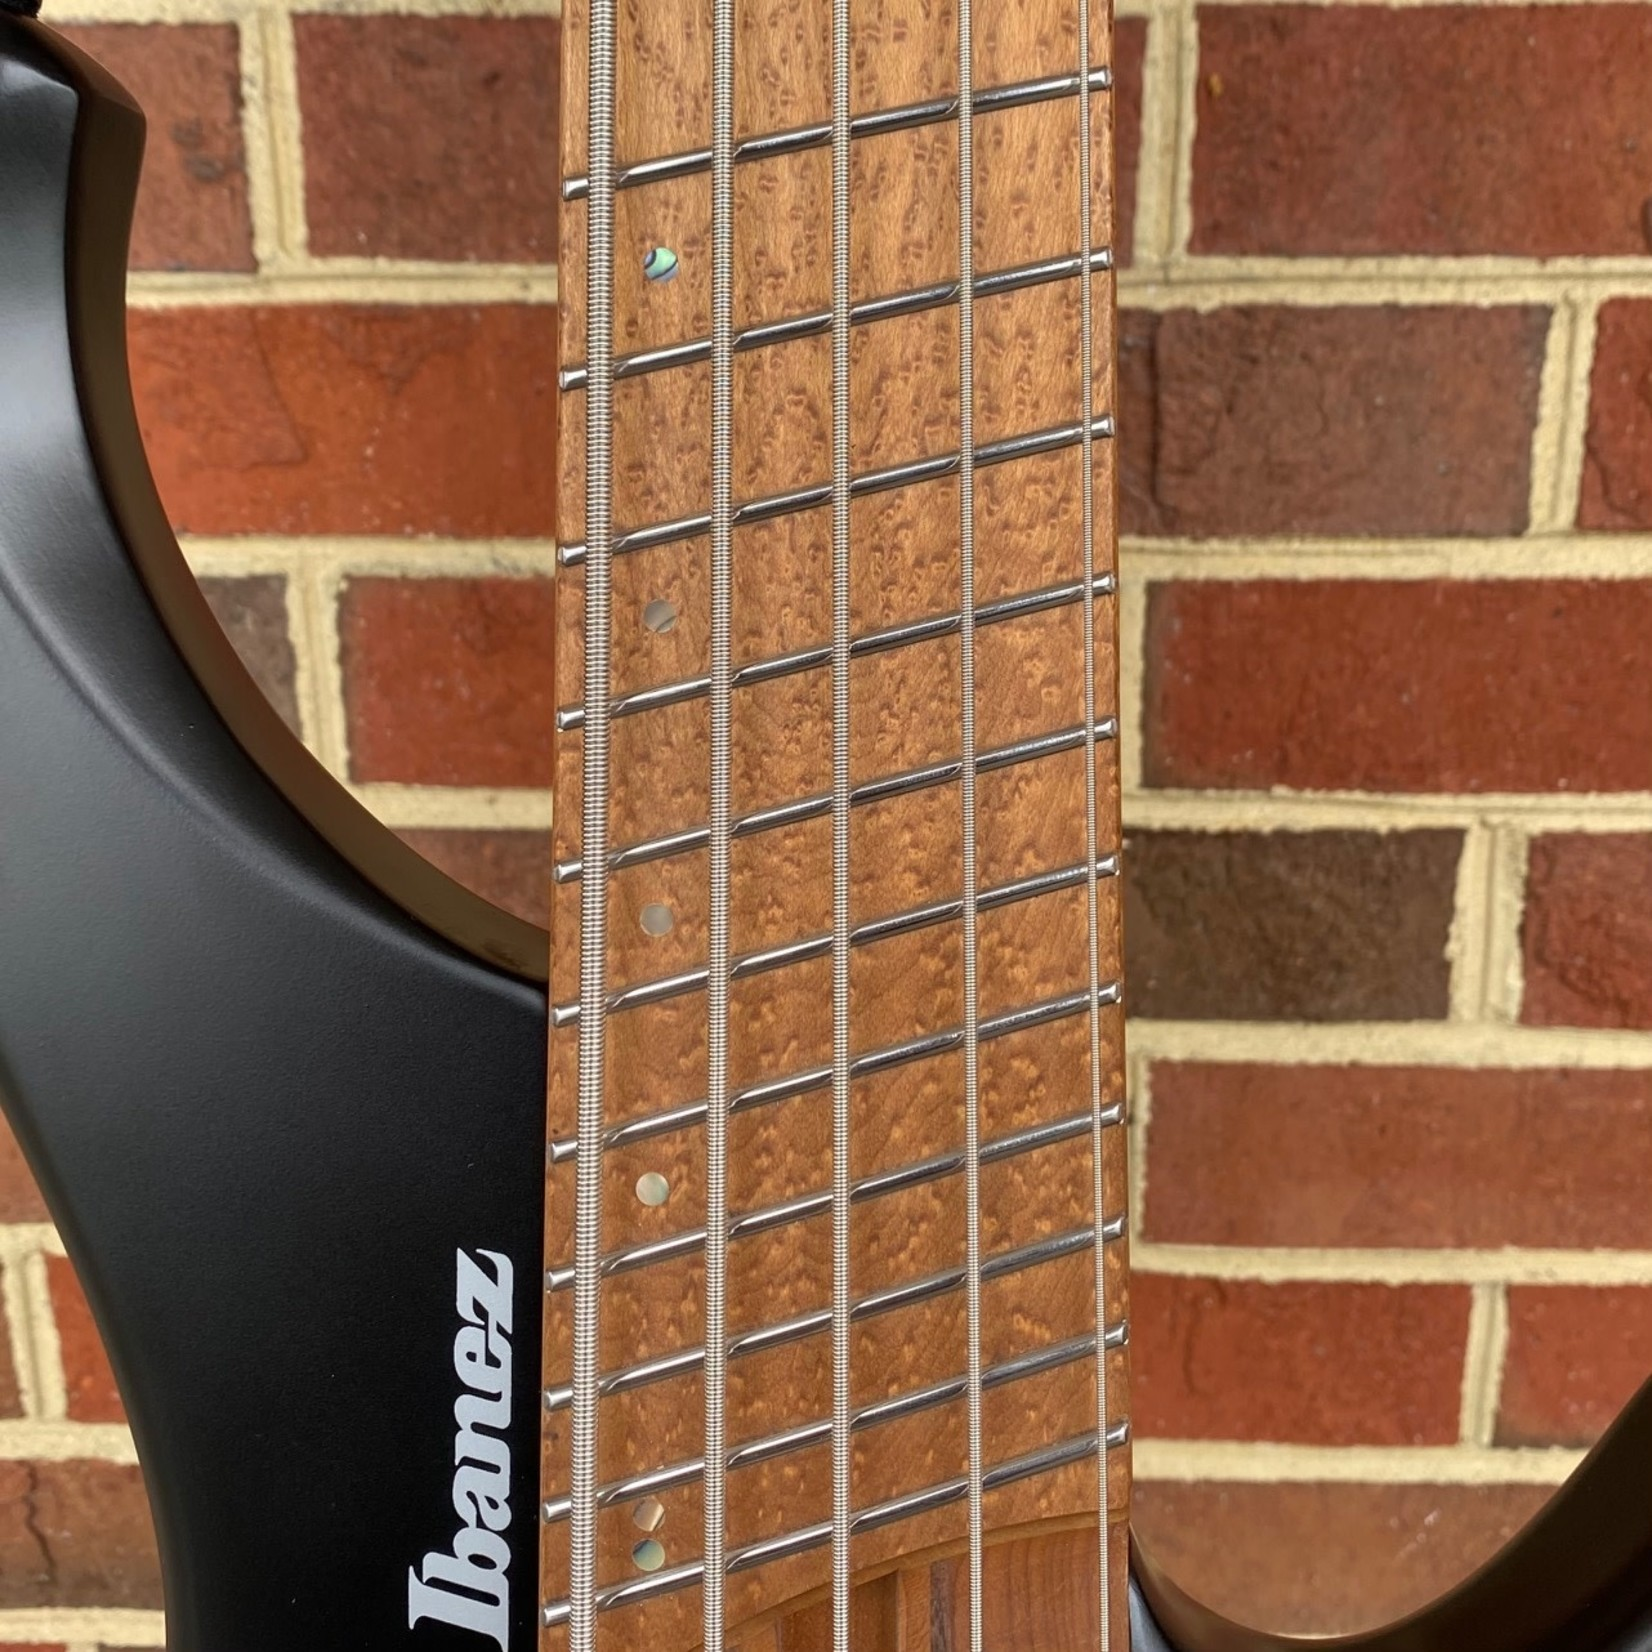 Ibanez Ibanez EHB1005MSBKF, Bass Workshop Headless Multi-Scale Bass, 5-String, Black Flat, SN# 211P01I201218124